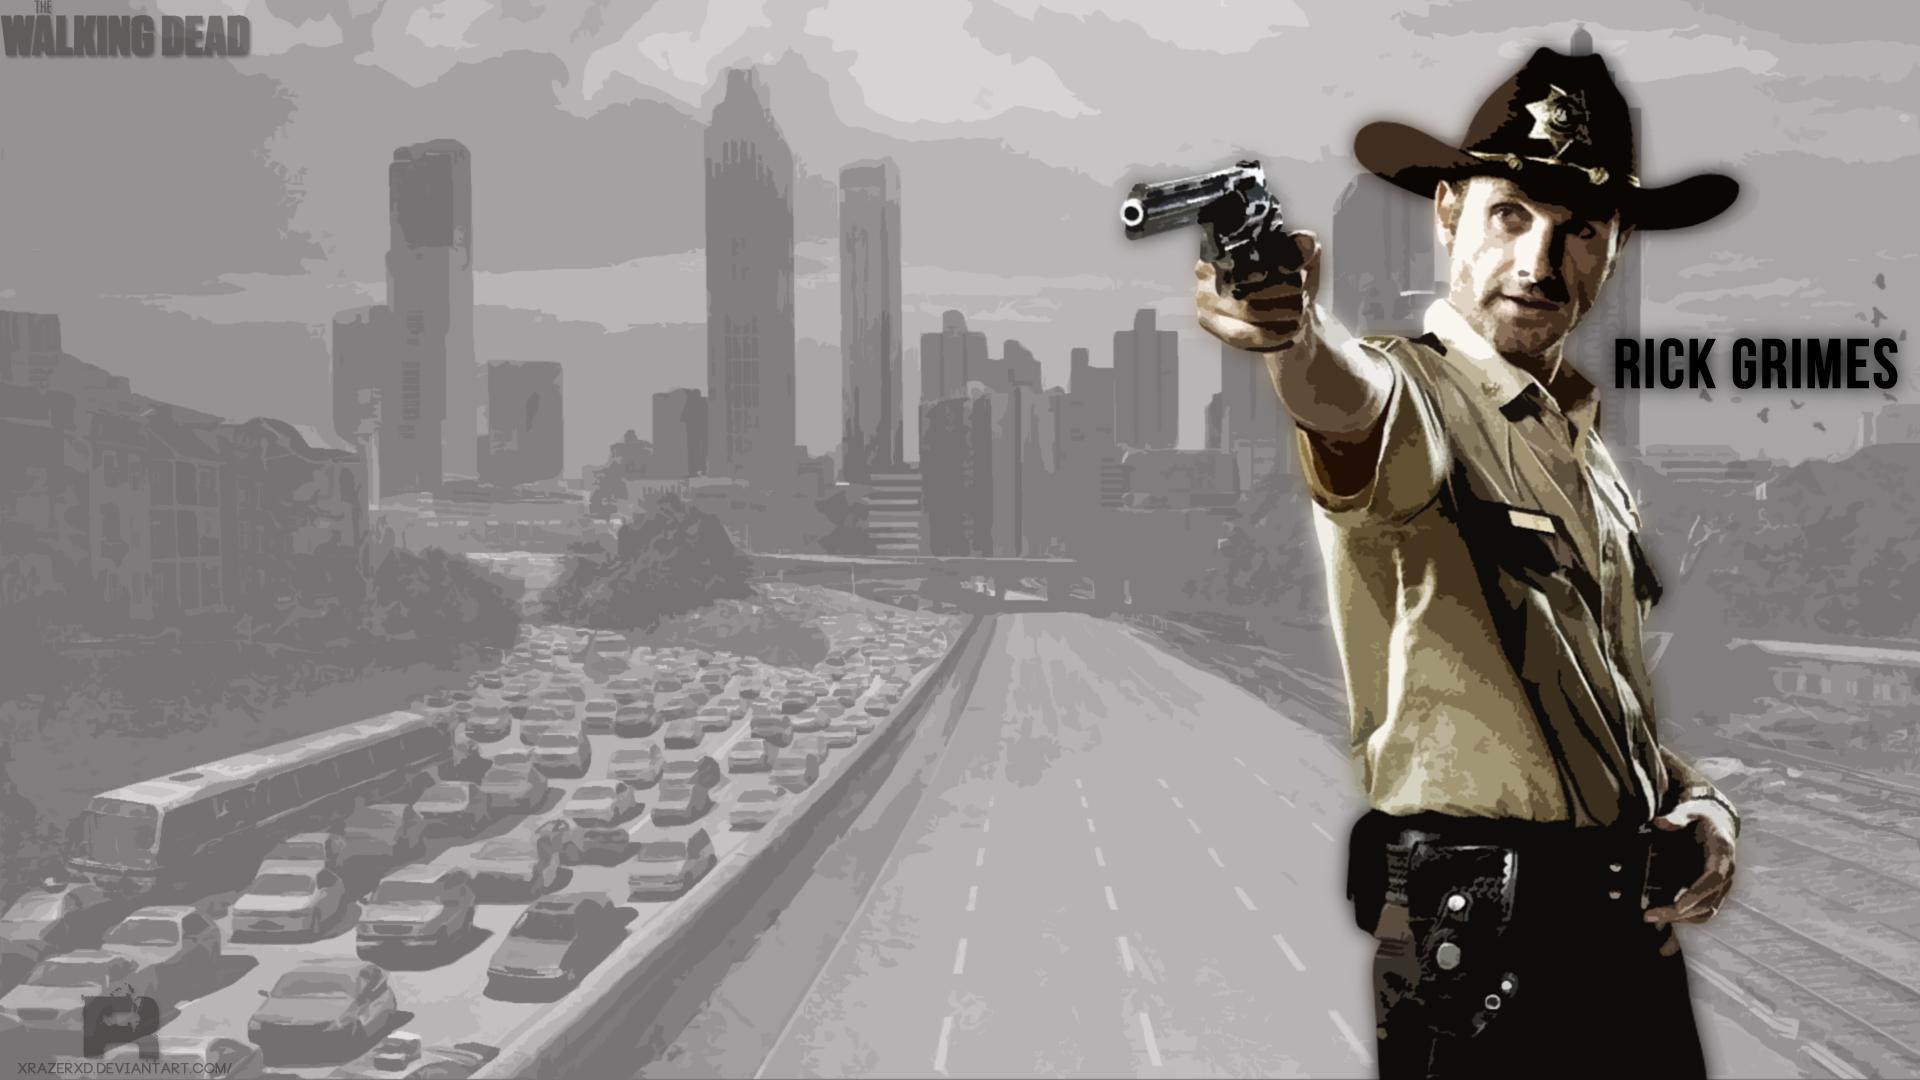 Wallpaper The Walking Dead Oscars Rick Grimes Tv Series